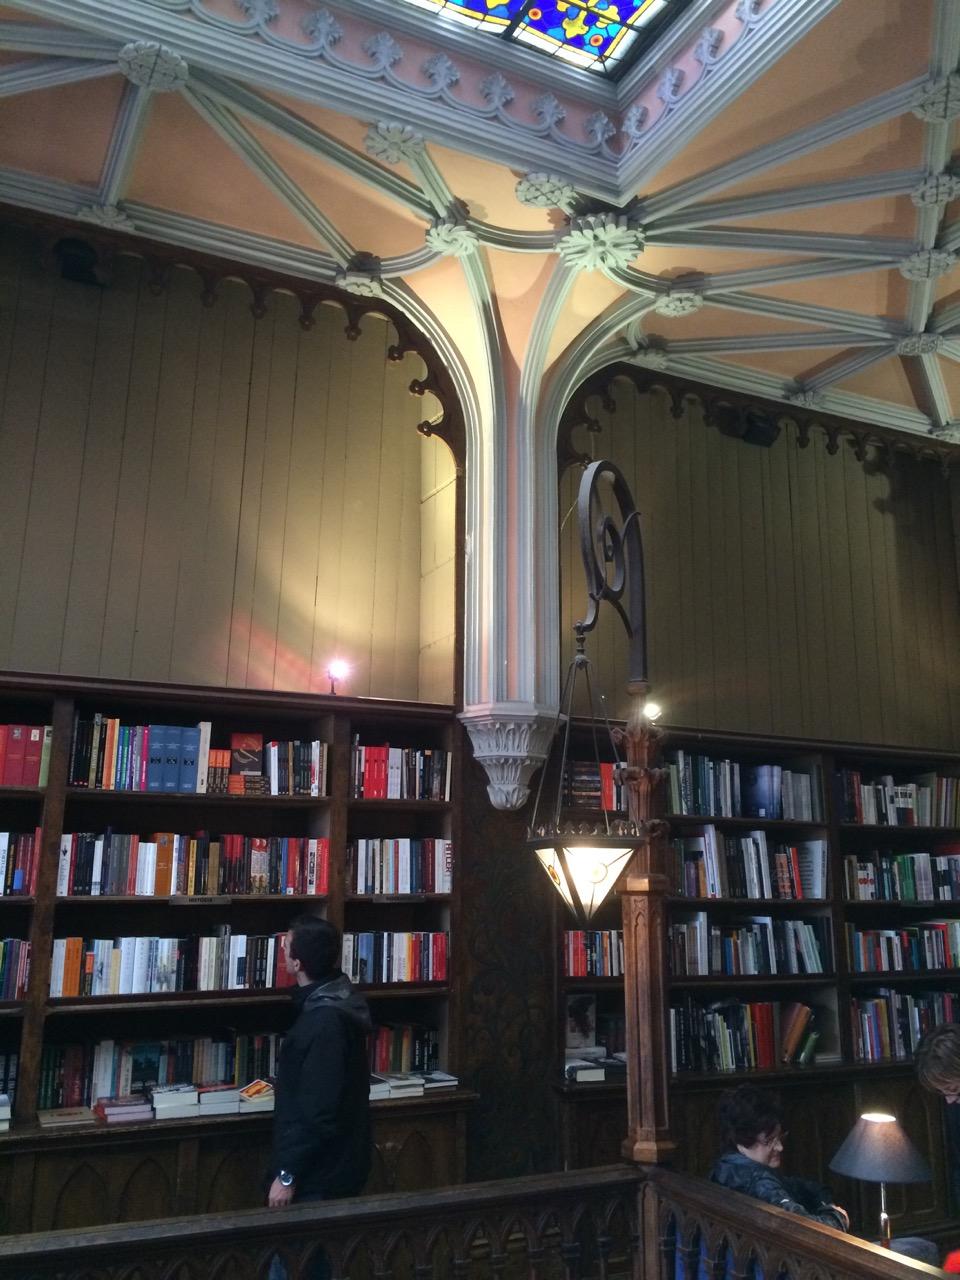 Livraria Lello, upper level